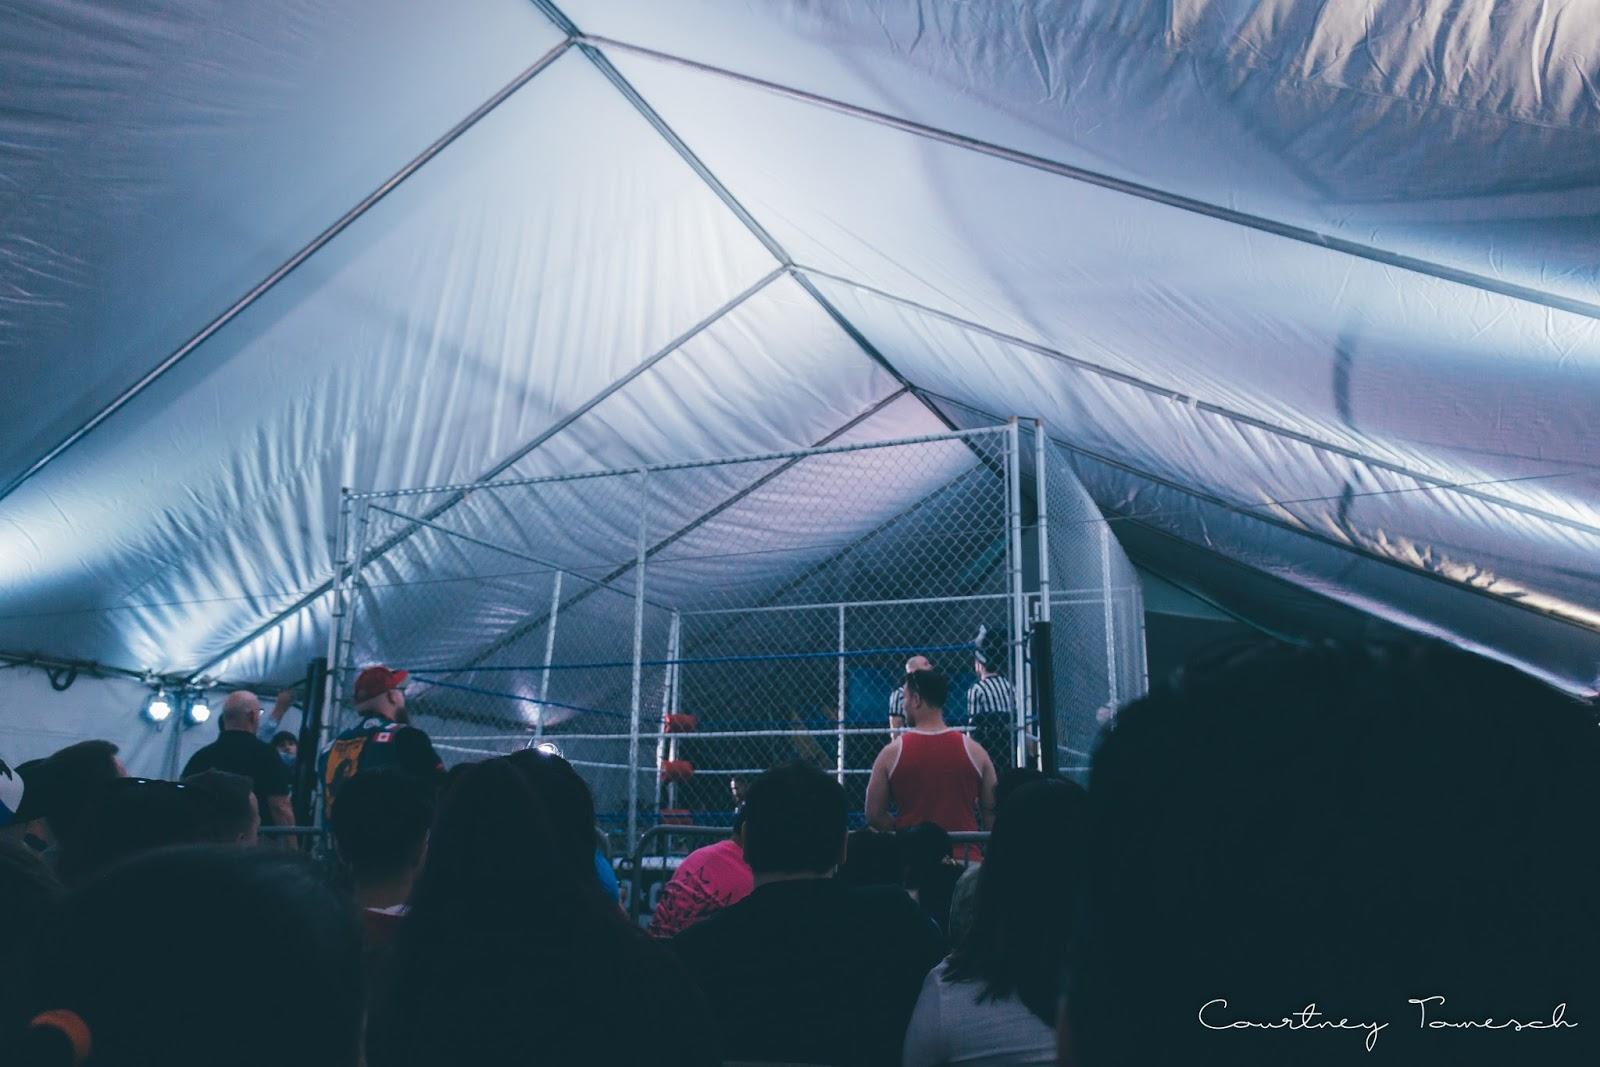 Courtney Tomesch SoCal Pro 11 Year Anniversary Show